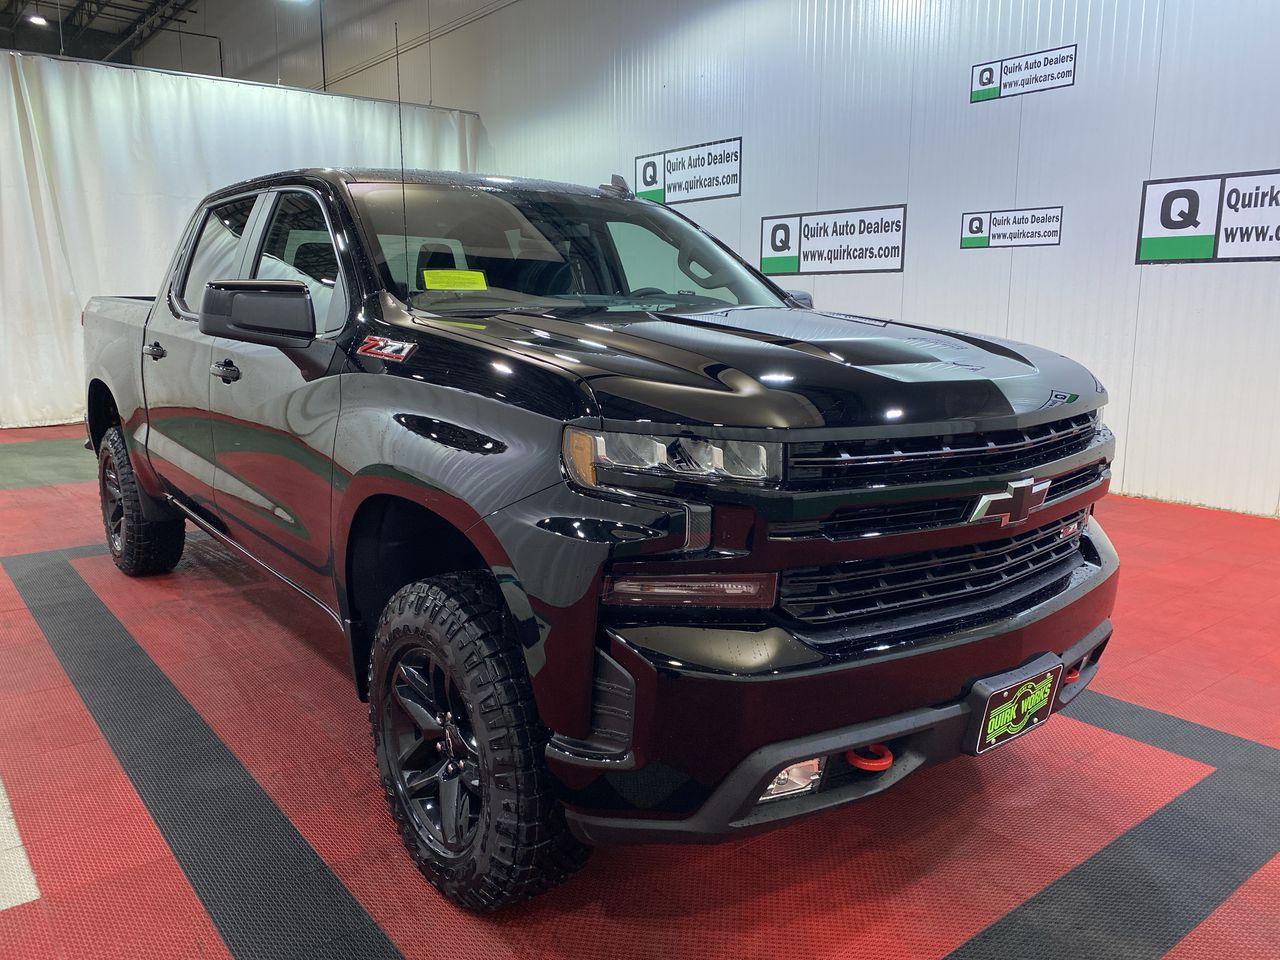 2021 Chevrolet Silverado 1500 CREW CAB TRAILBOSS 4WD